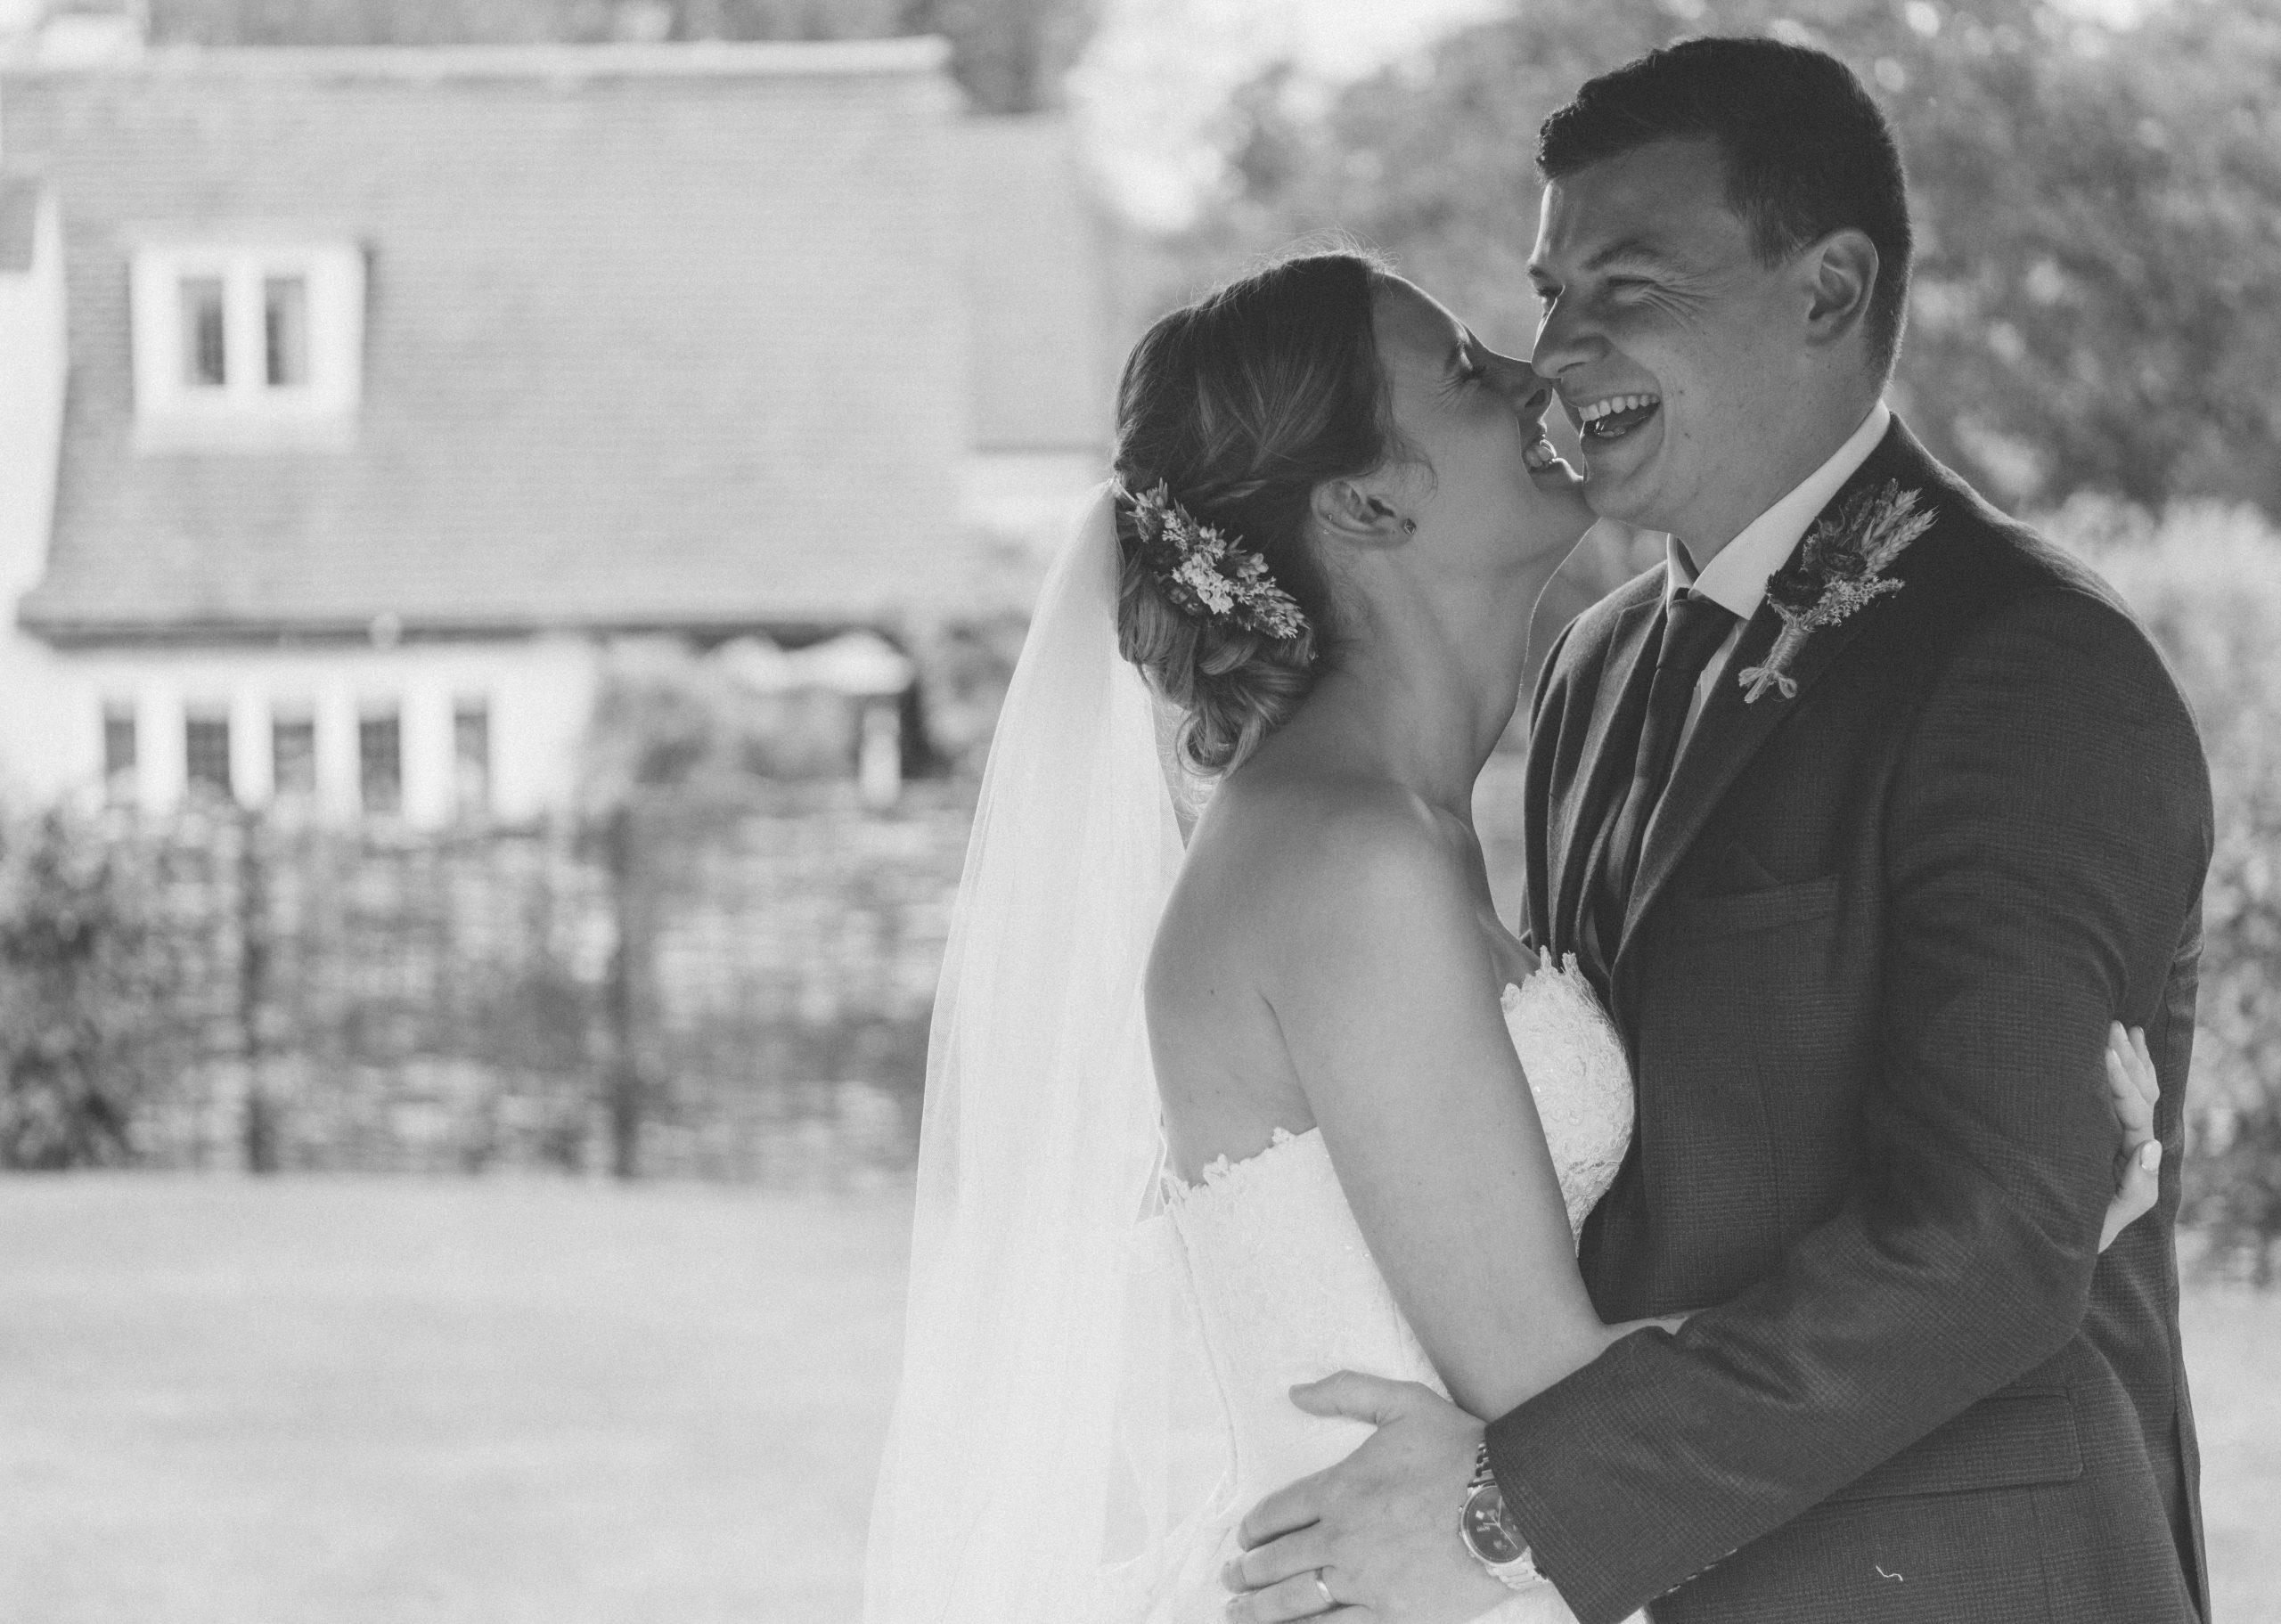 The warren estate wedding photographer